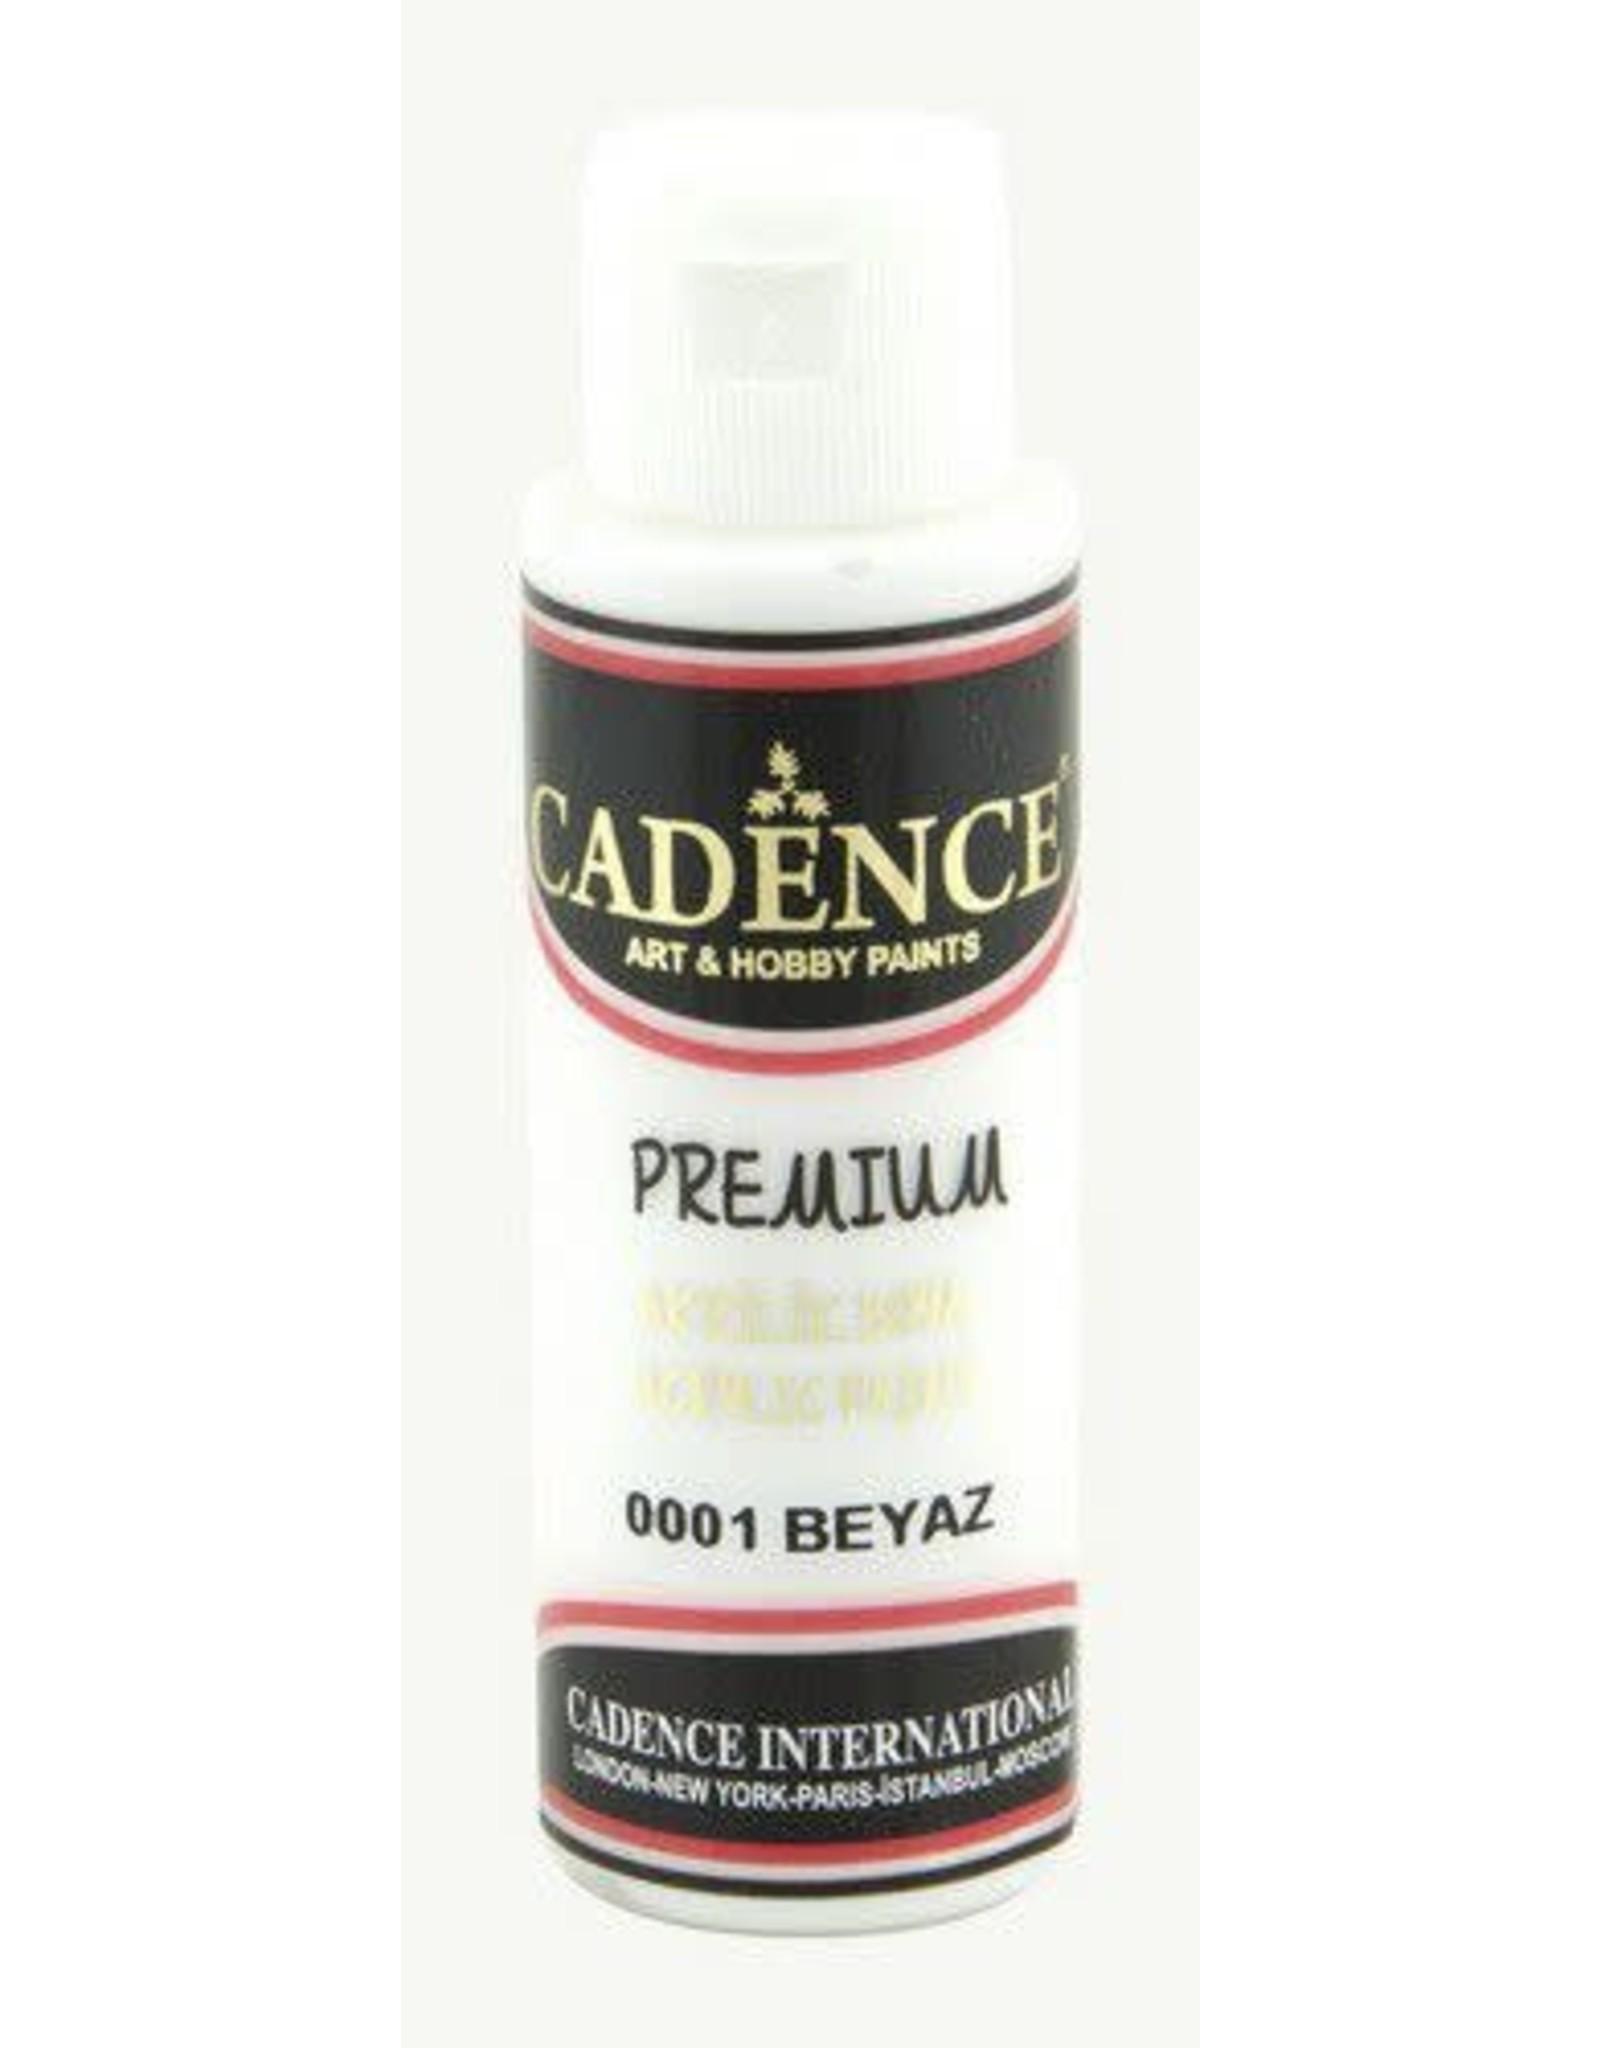 Cadence Cadence Premium acrylverf (semi mat) Wit